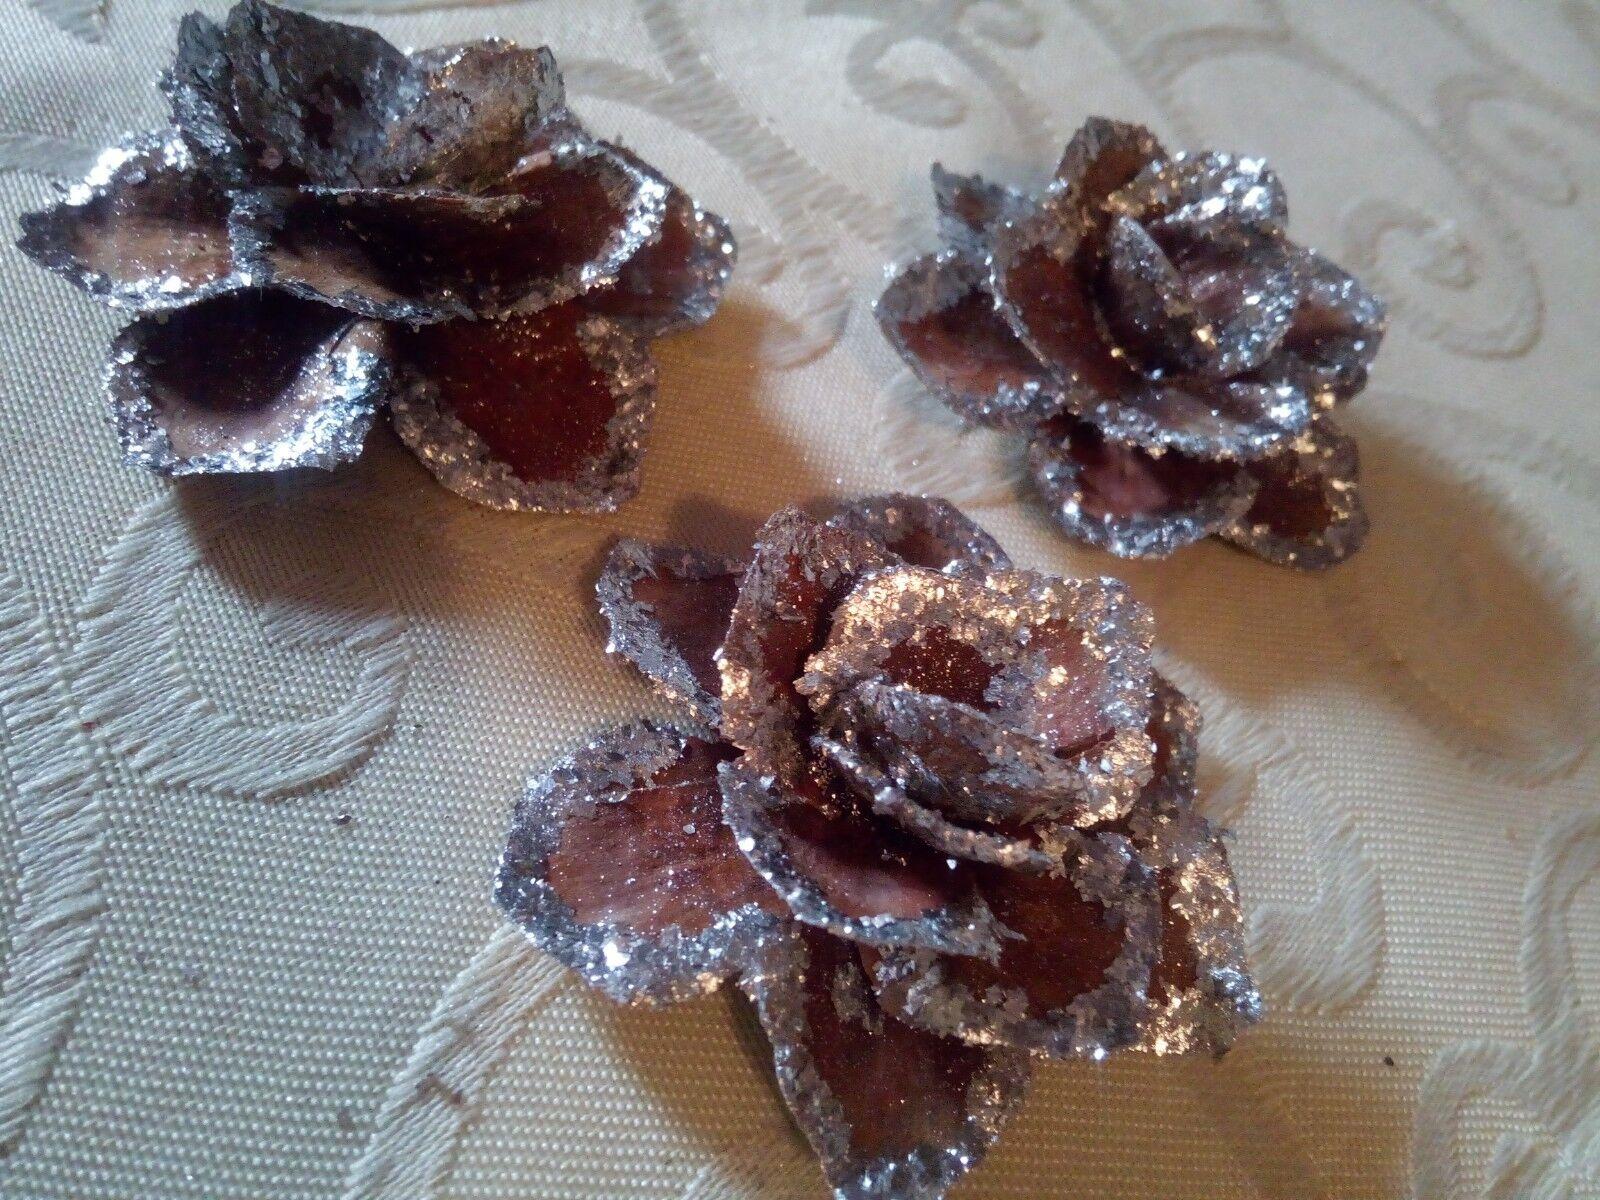 100pcs Pine cone decoration flower christmas wedding table decor wreath  garland